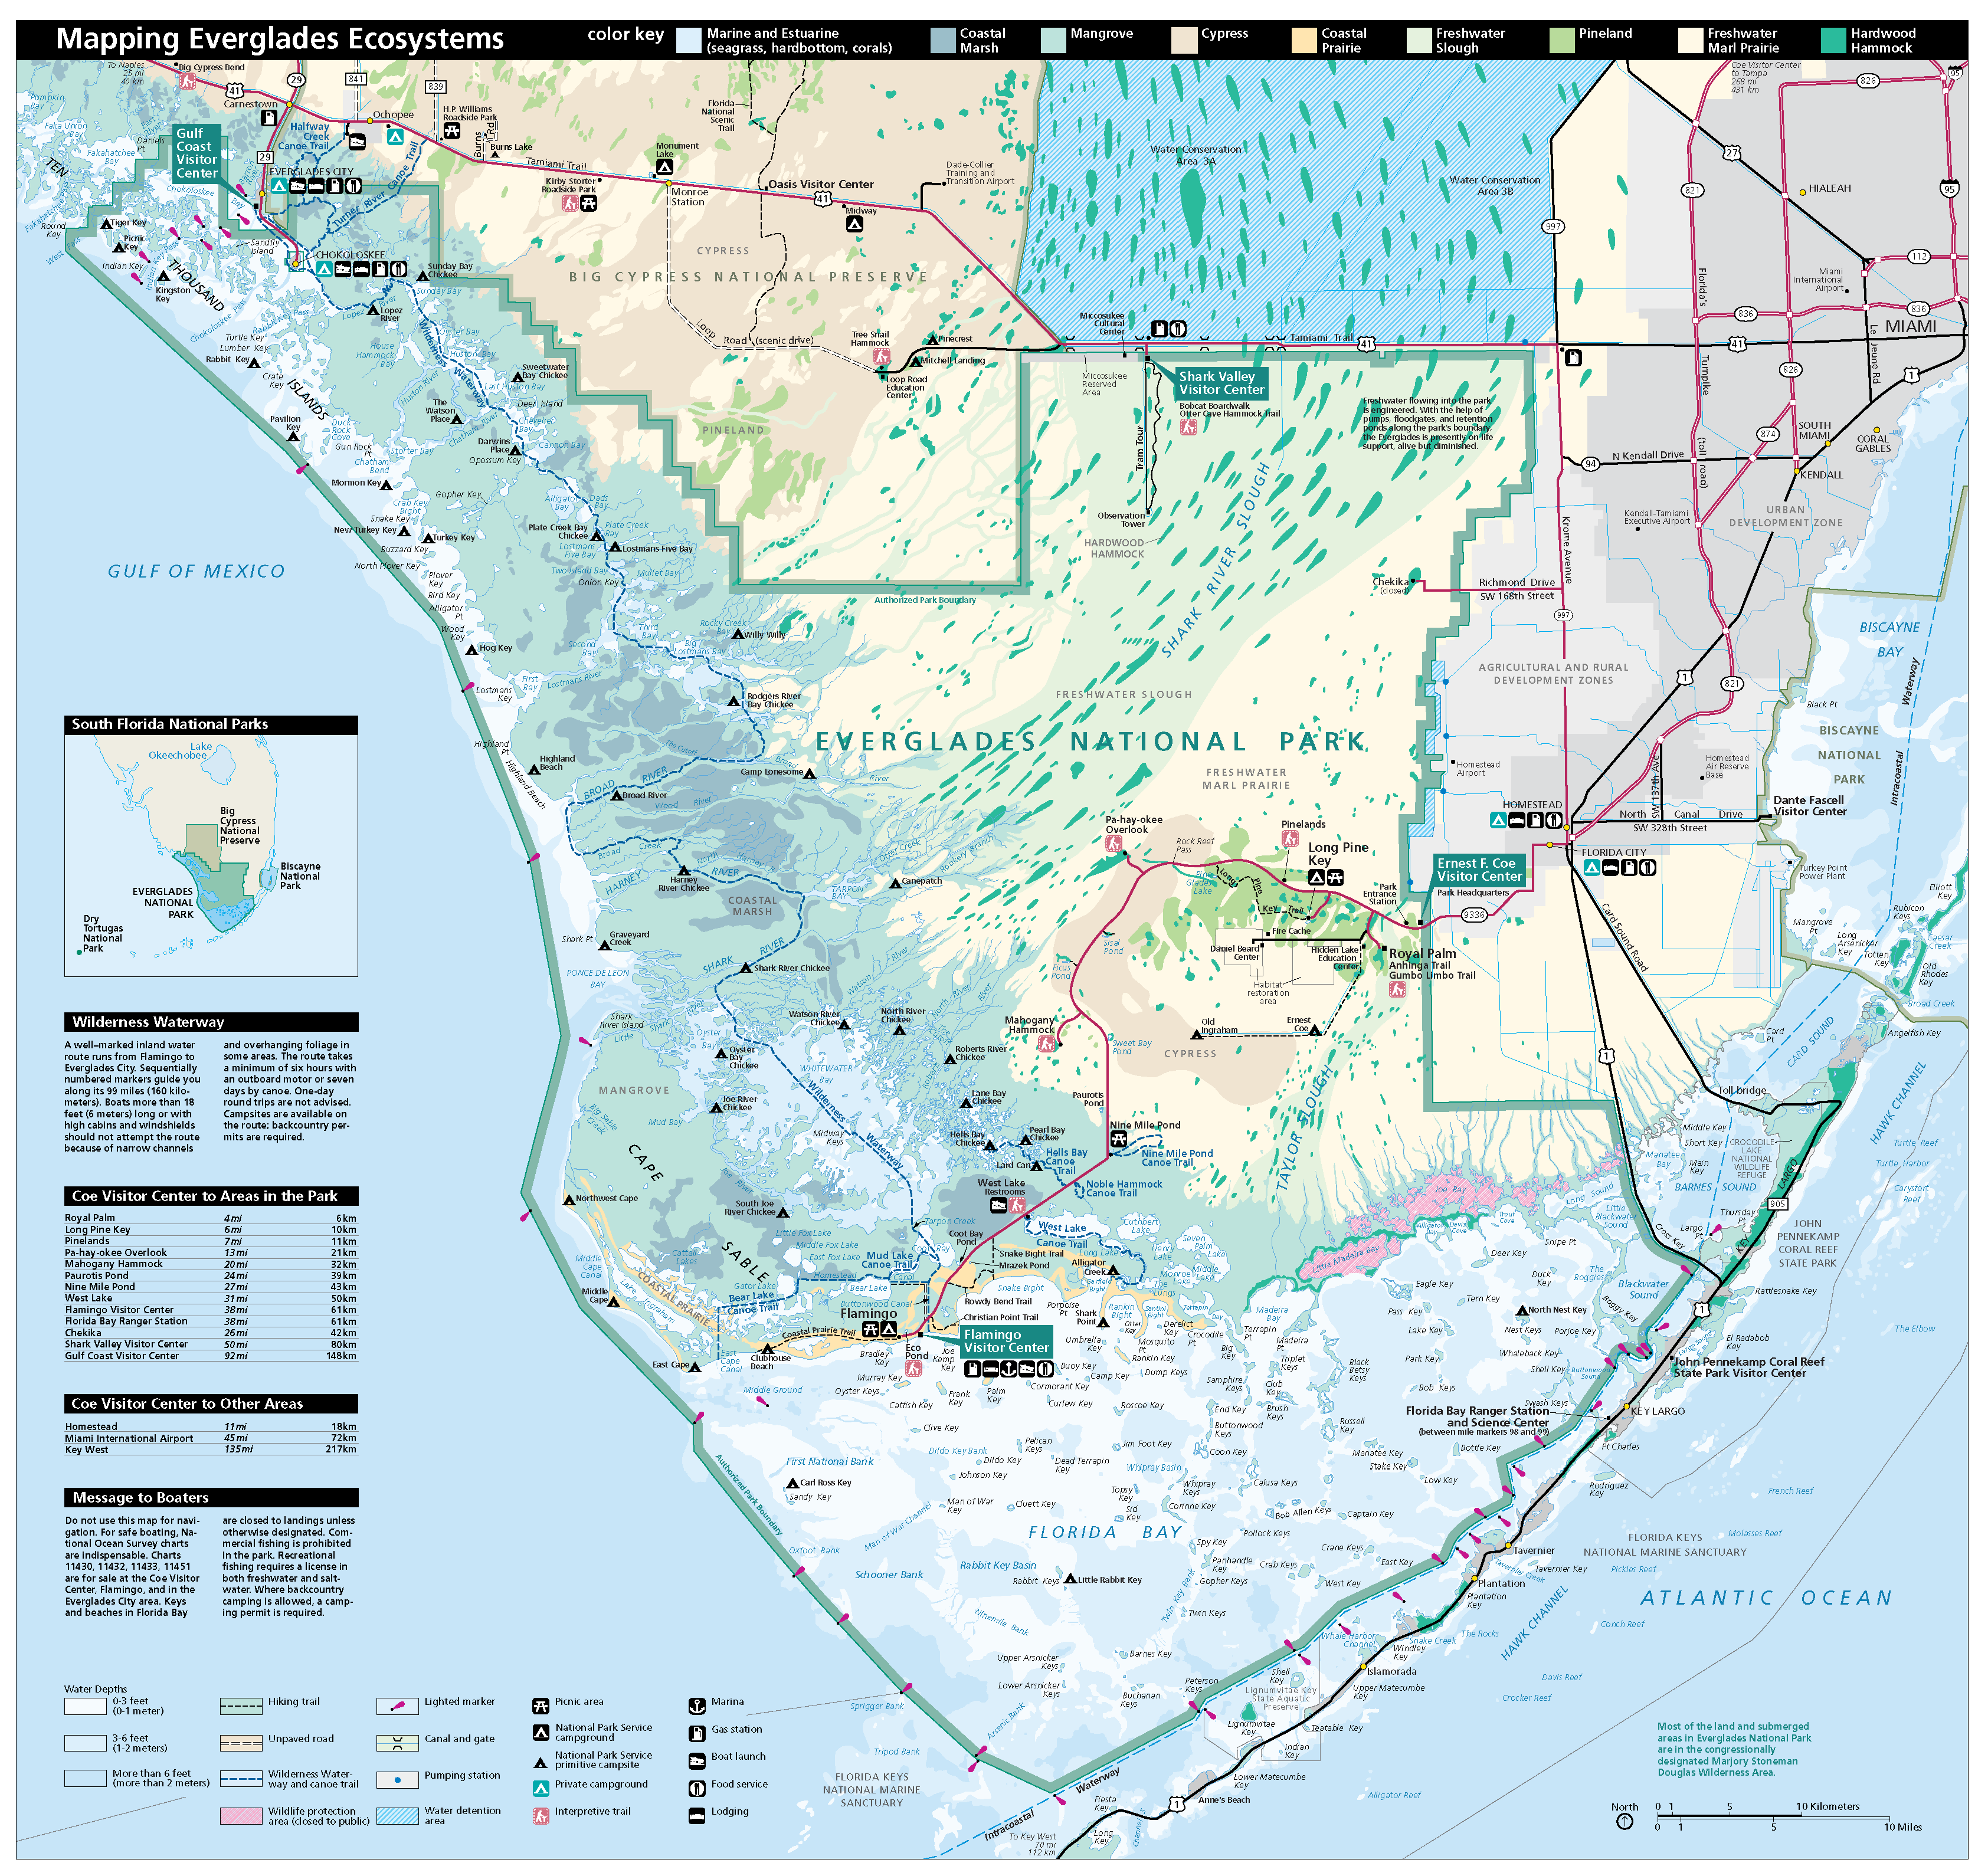 Everglades National Park Map Hiking Trails Pinterest - Everglades on us map